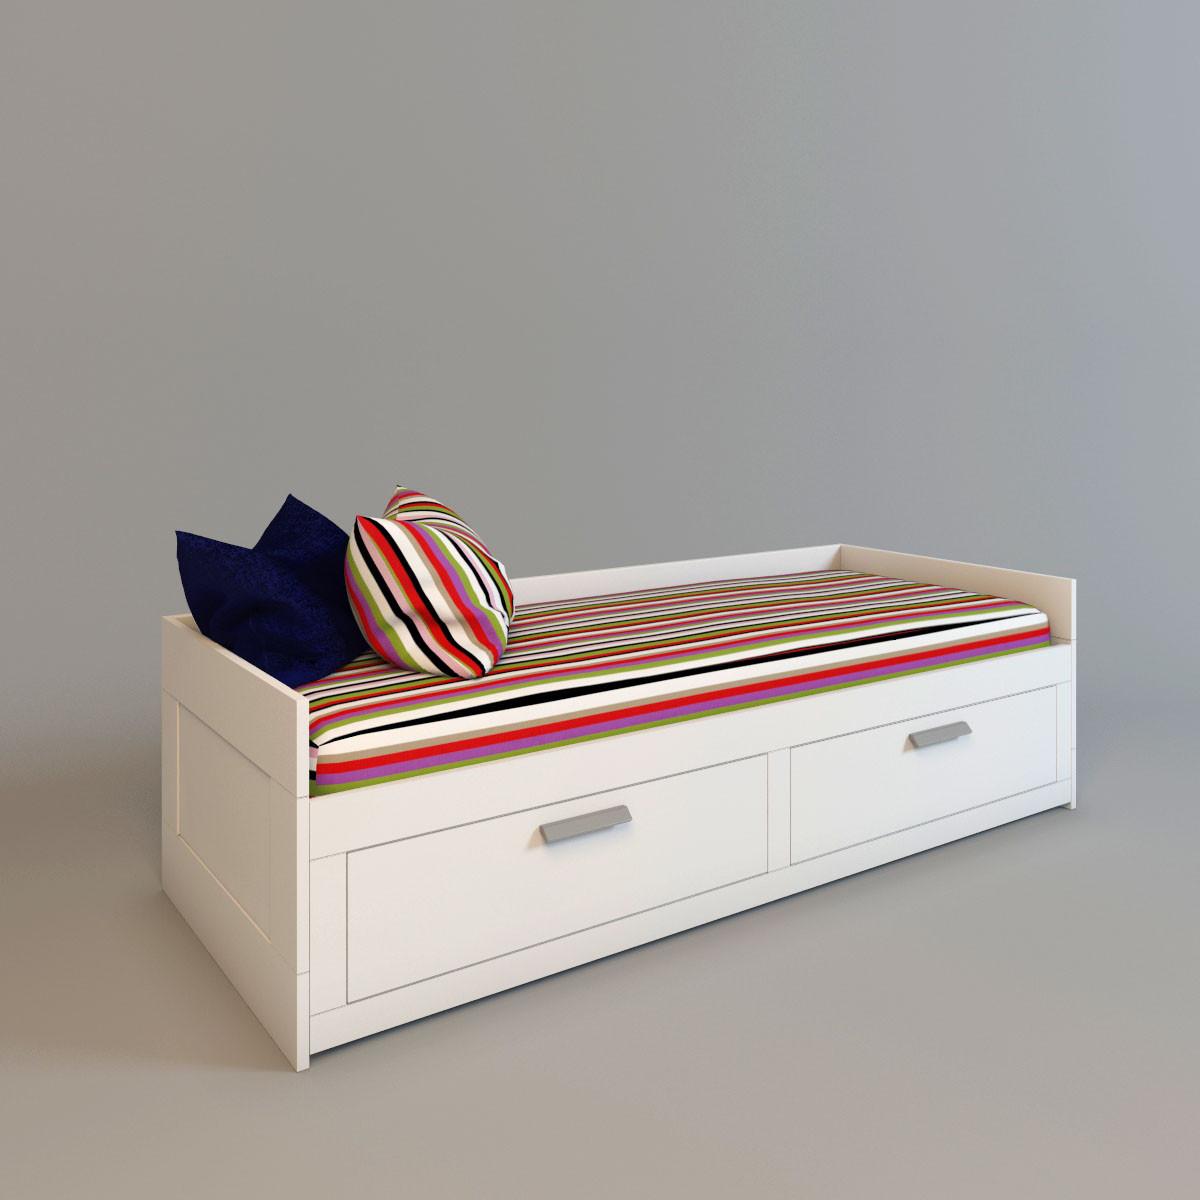 brimnes bed interior 3d model, Hause deko